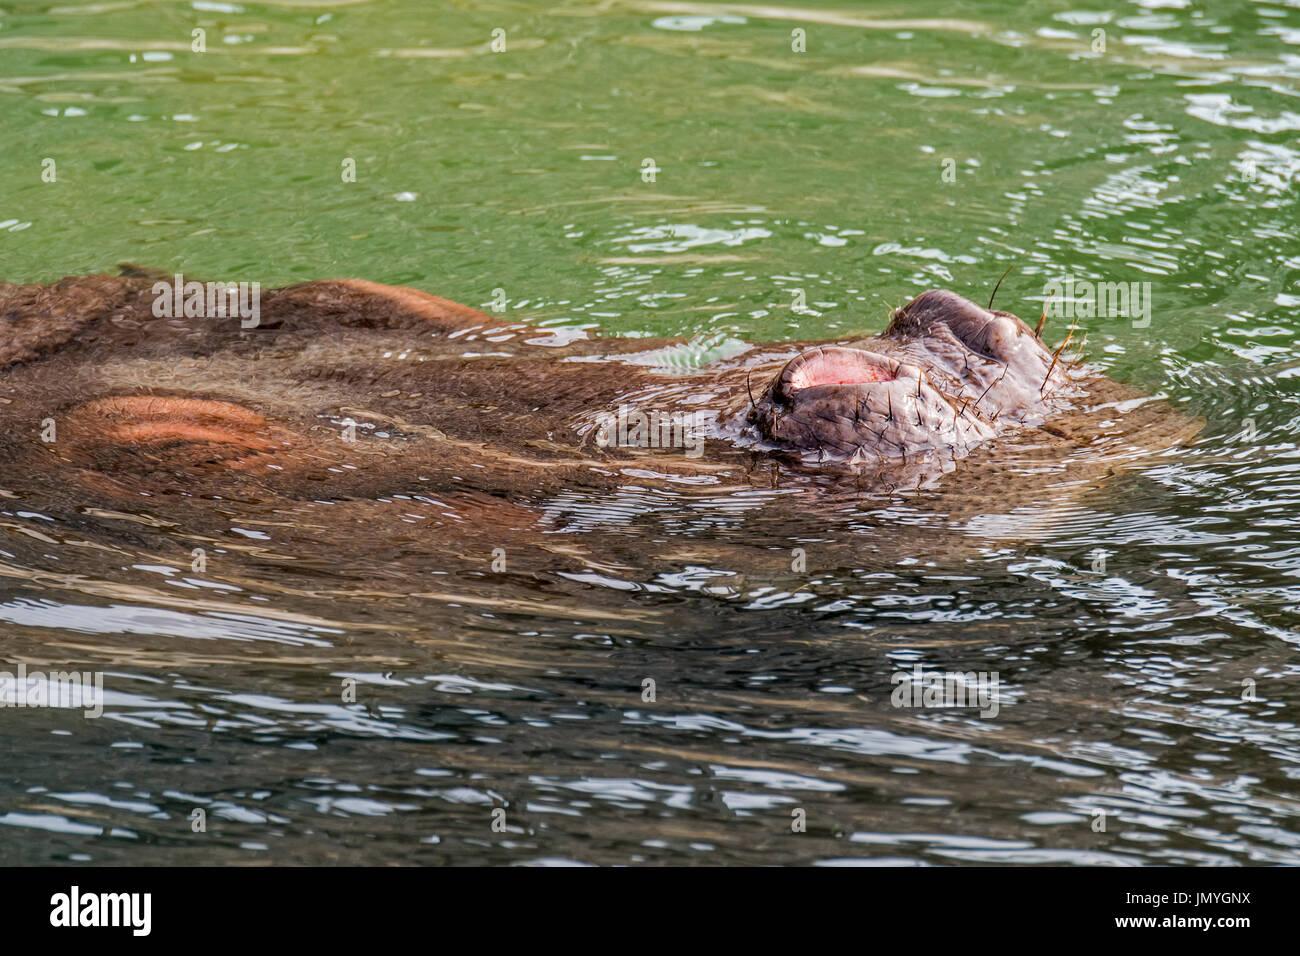 Submerged common hippopotamus / hippo (Hippopotamus amphibius) surfacing to breathe through exposed nostrils in - Stock Image